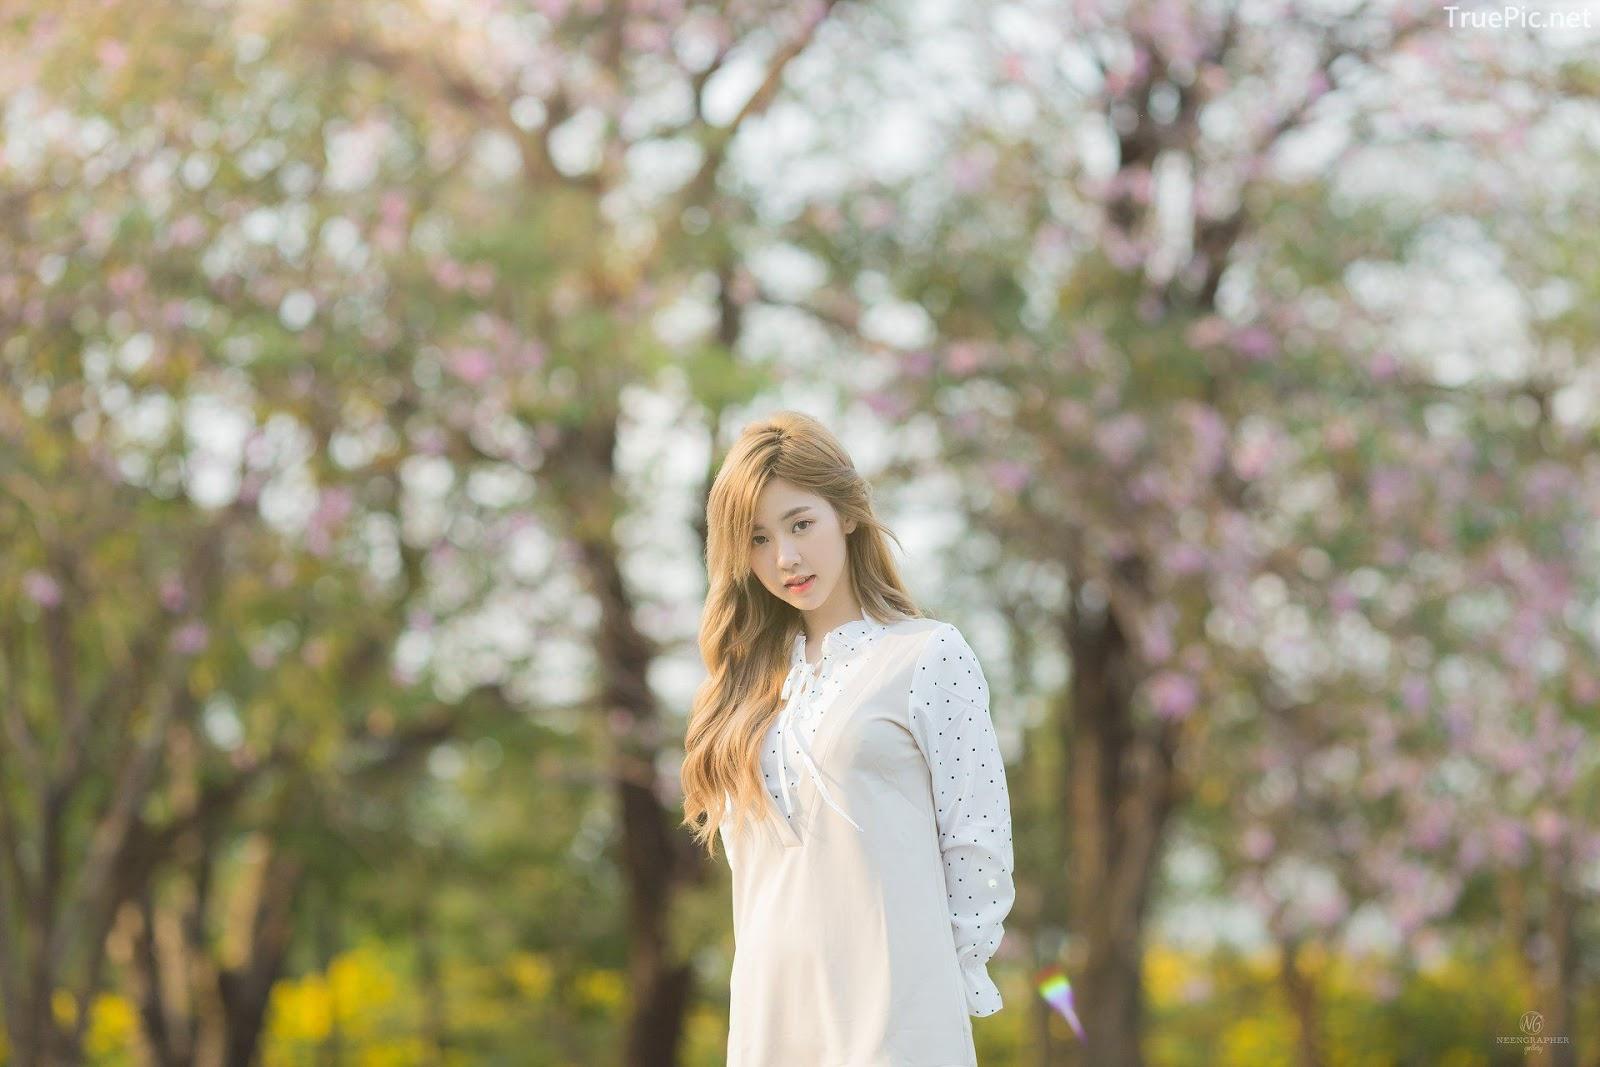 Thailand cute model Nilawan Iamchuasawad - Beautiful girl in the flower field - Photo by จิตรทิวัส จั่นระยับ - Picture 3